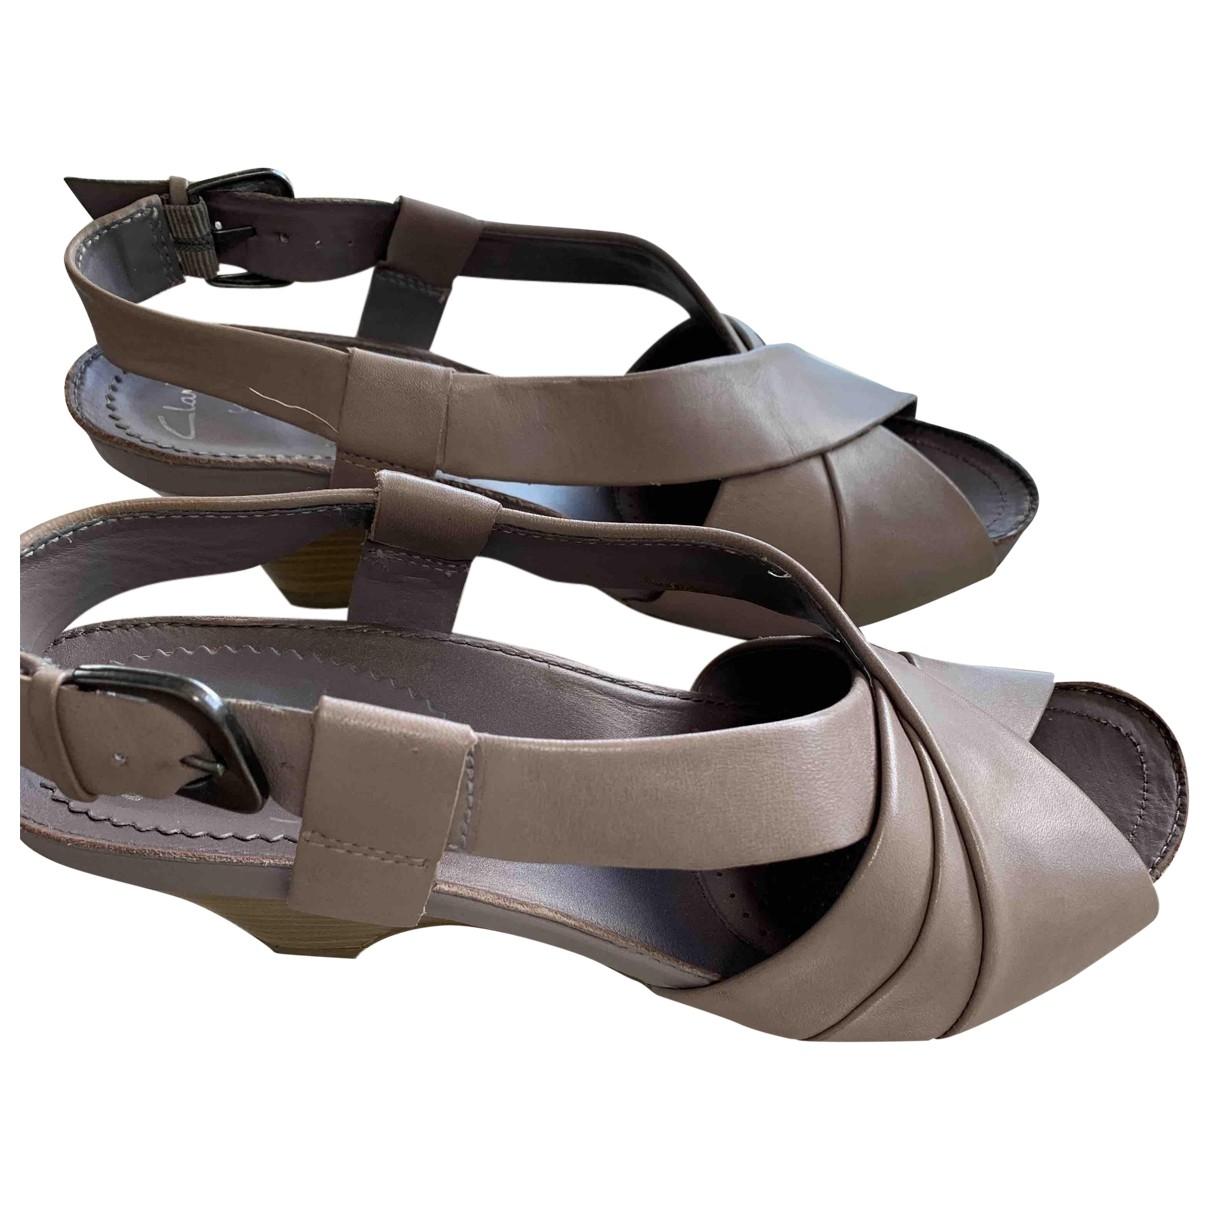 Sandalias de Cuero Clarks